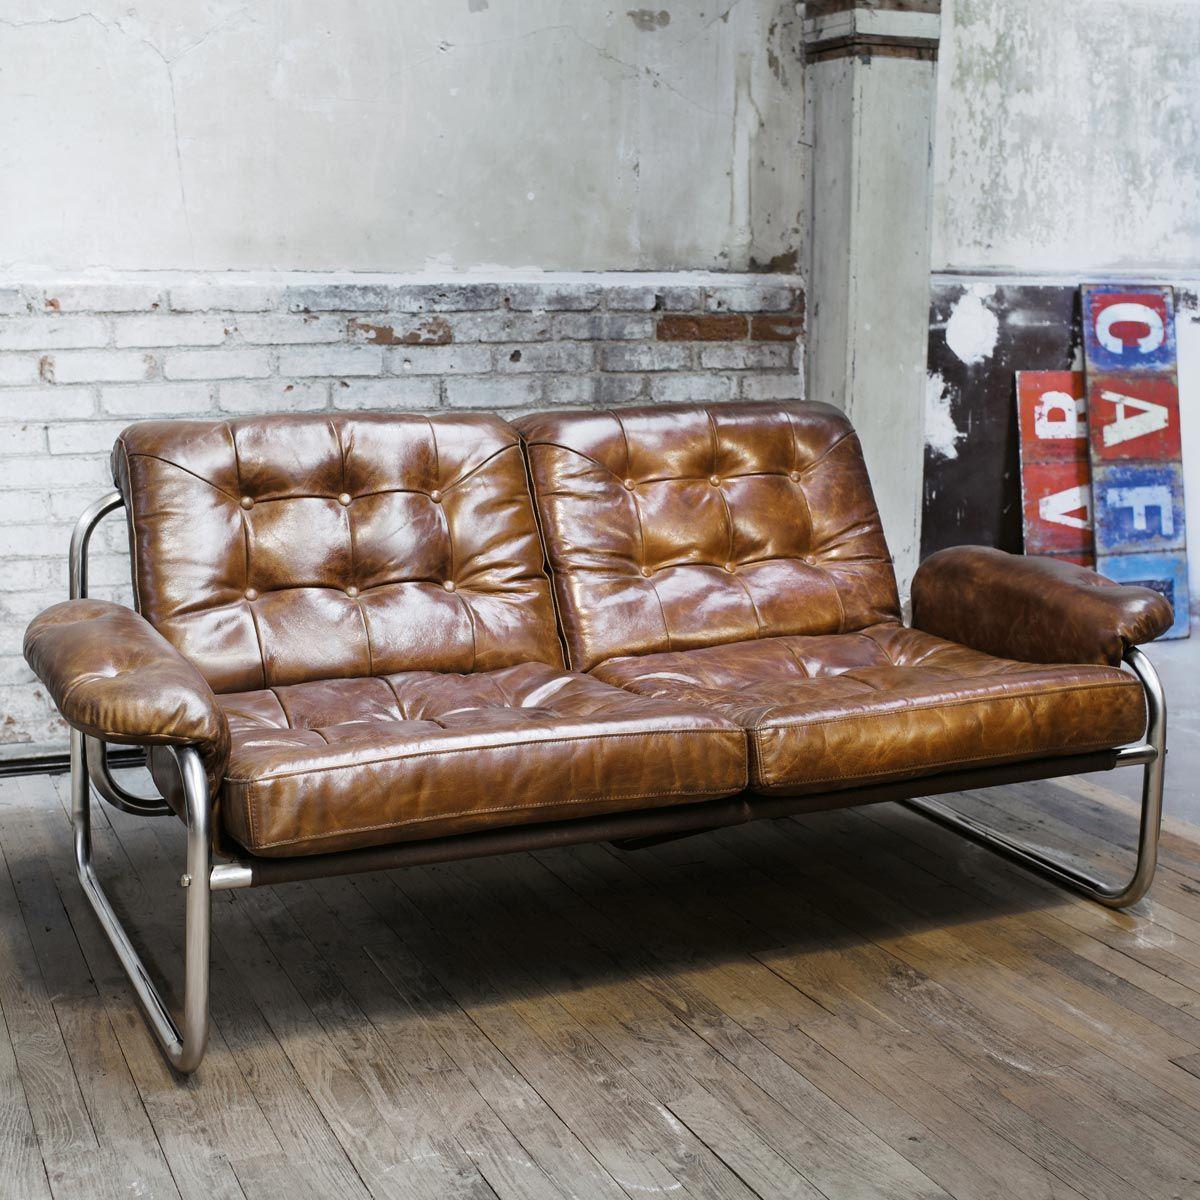 2 Sitzer Vintage Polsterbank Aus Leder Braun Vintage Sofa